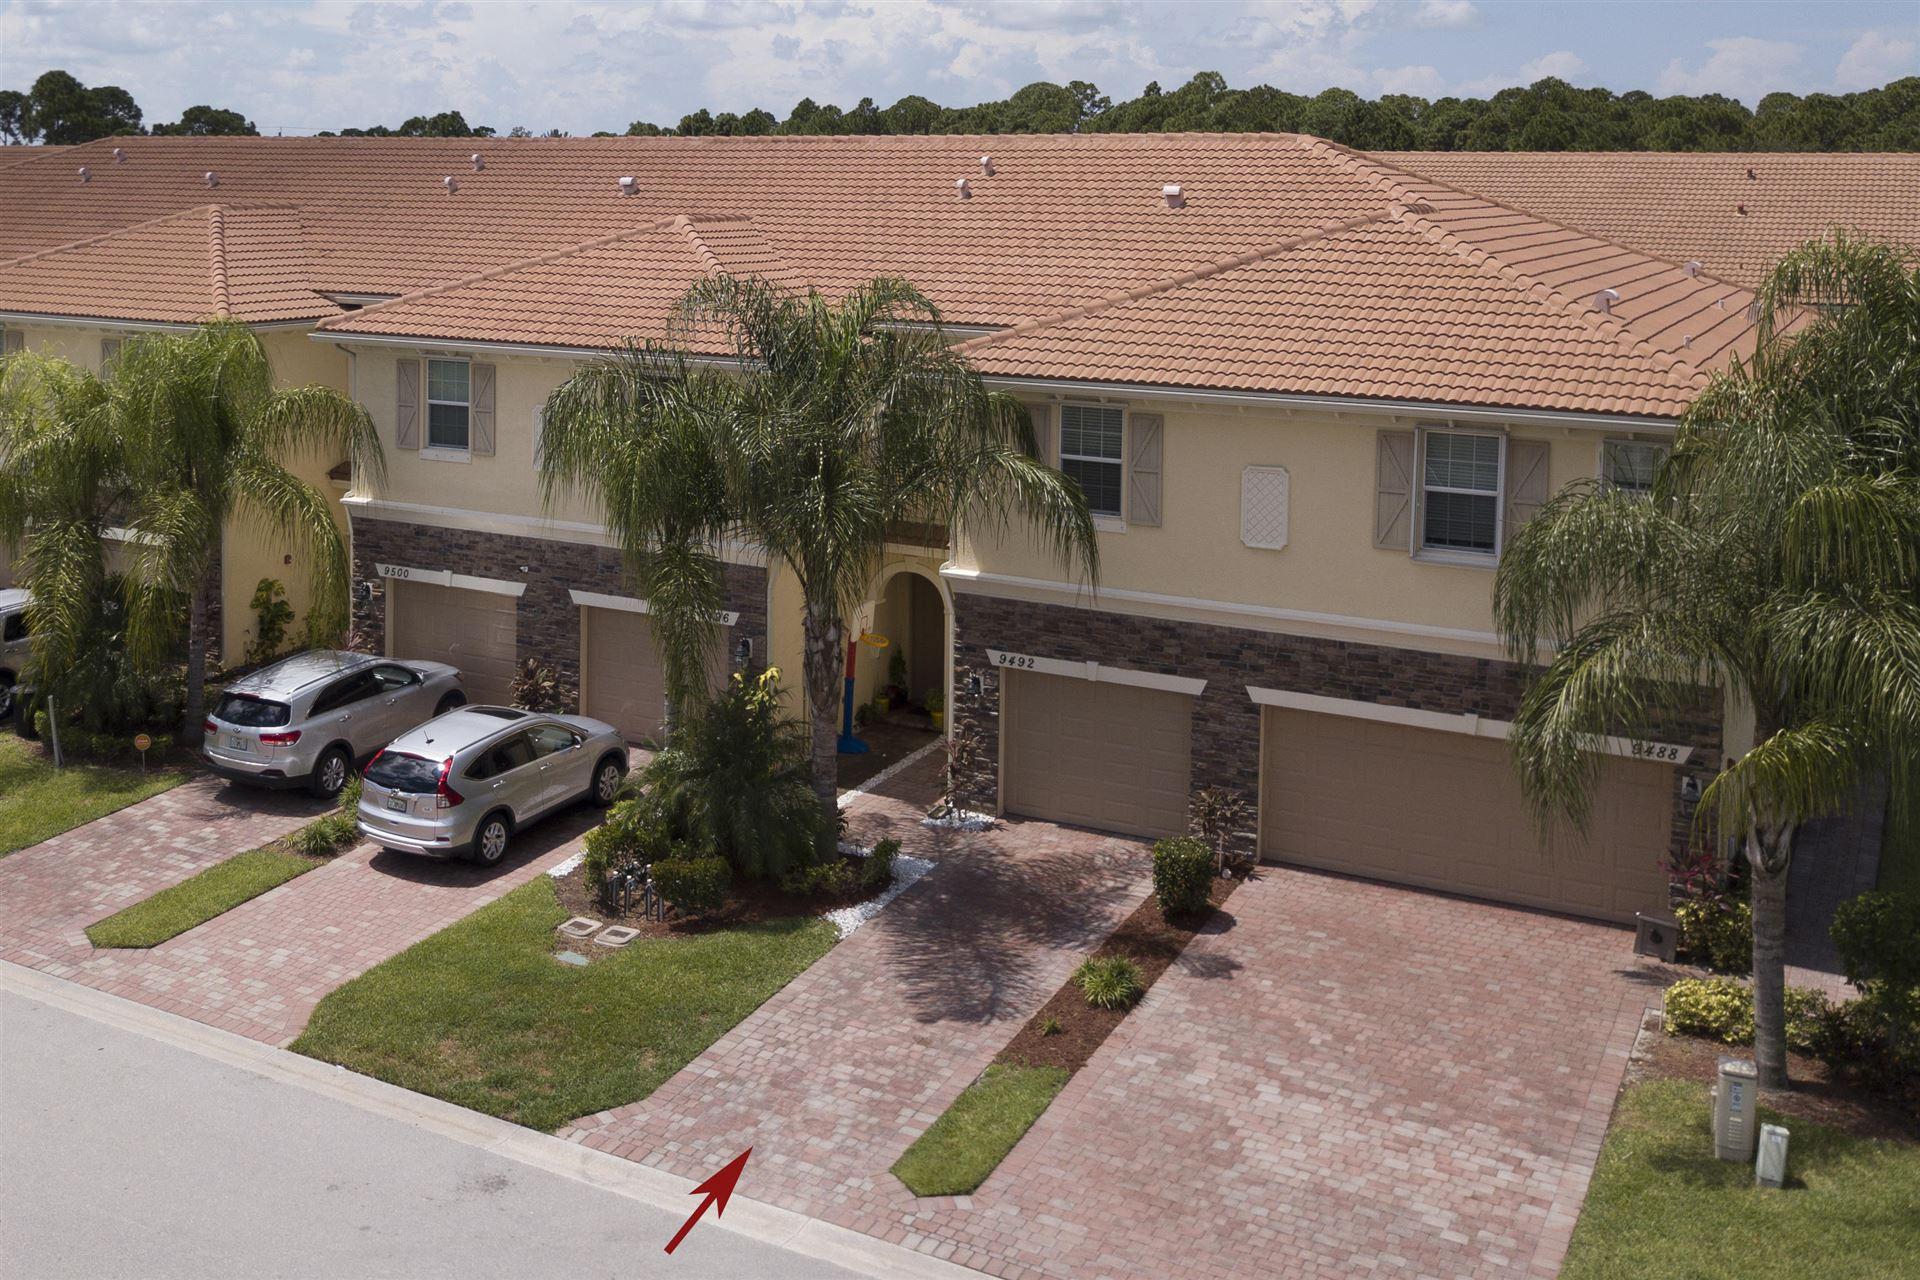 9492 SW Otter Lane, Stuart, FL 34997 - #: RX-10651789